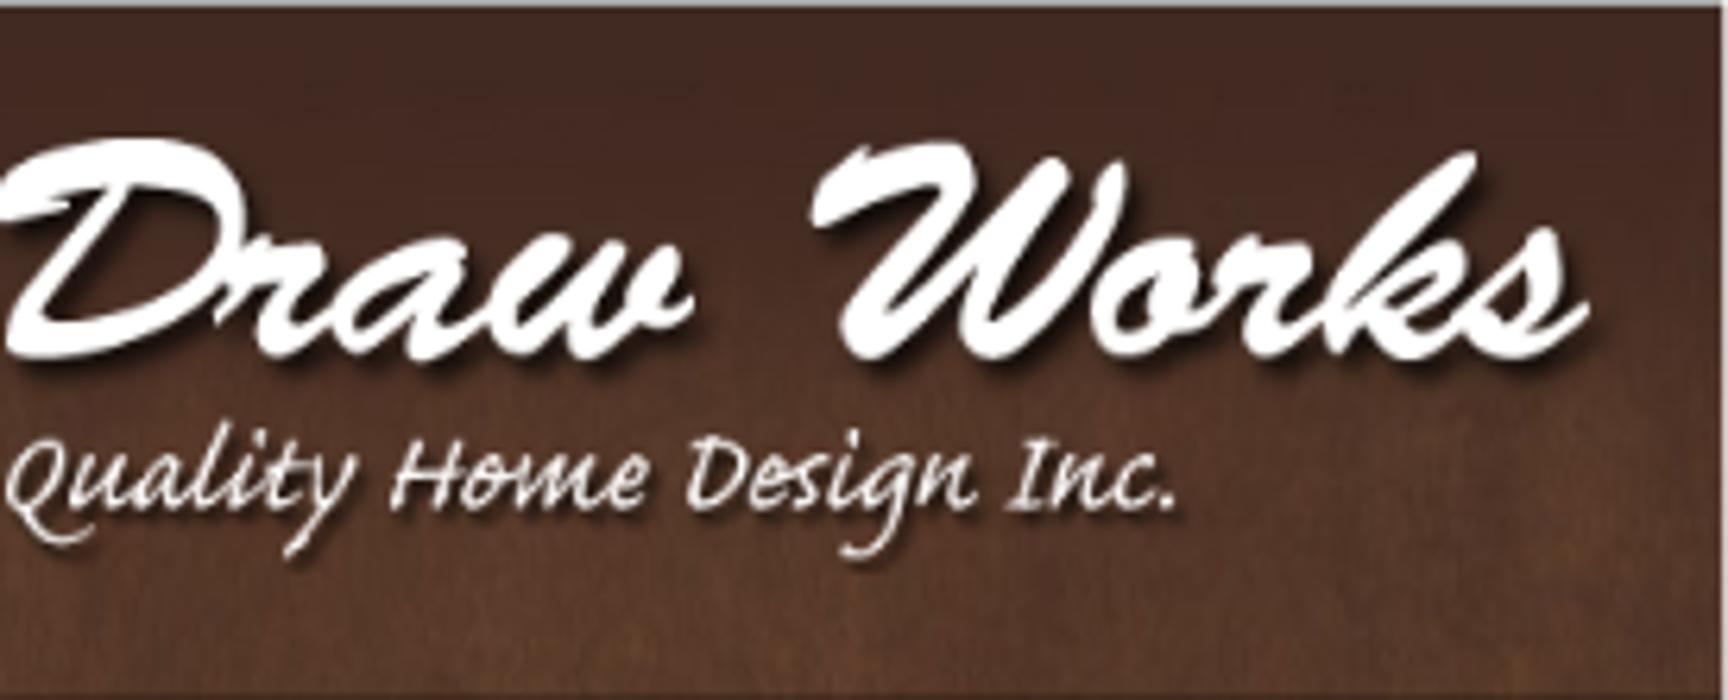 Draw Works Quality Home Design Inc - Hurricane, UT